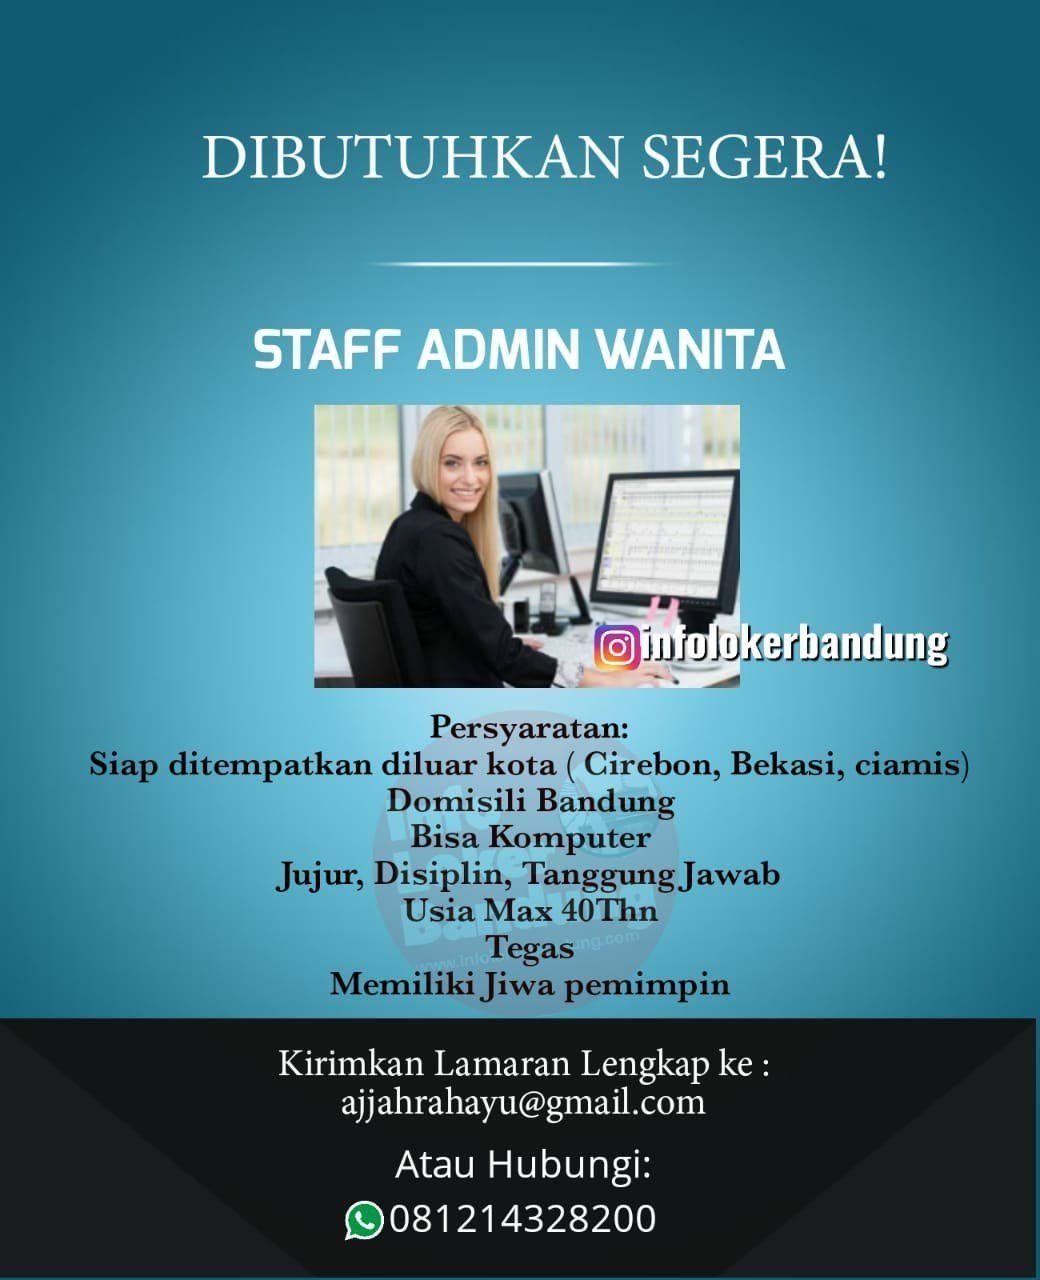 Lowongan Kerja Staff Admin Wanita Mei 2019 Kota Cirebon Kota Periklanan